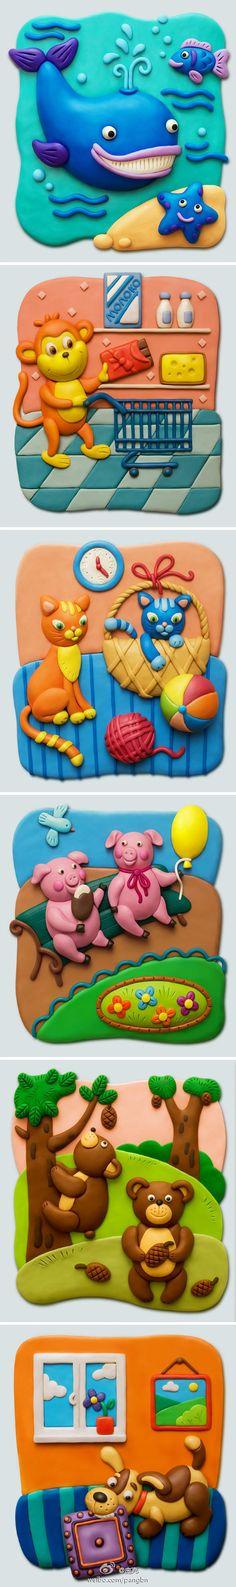 Cartoon clay modeling  http://revision.ru/a/bingo/